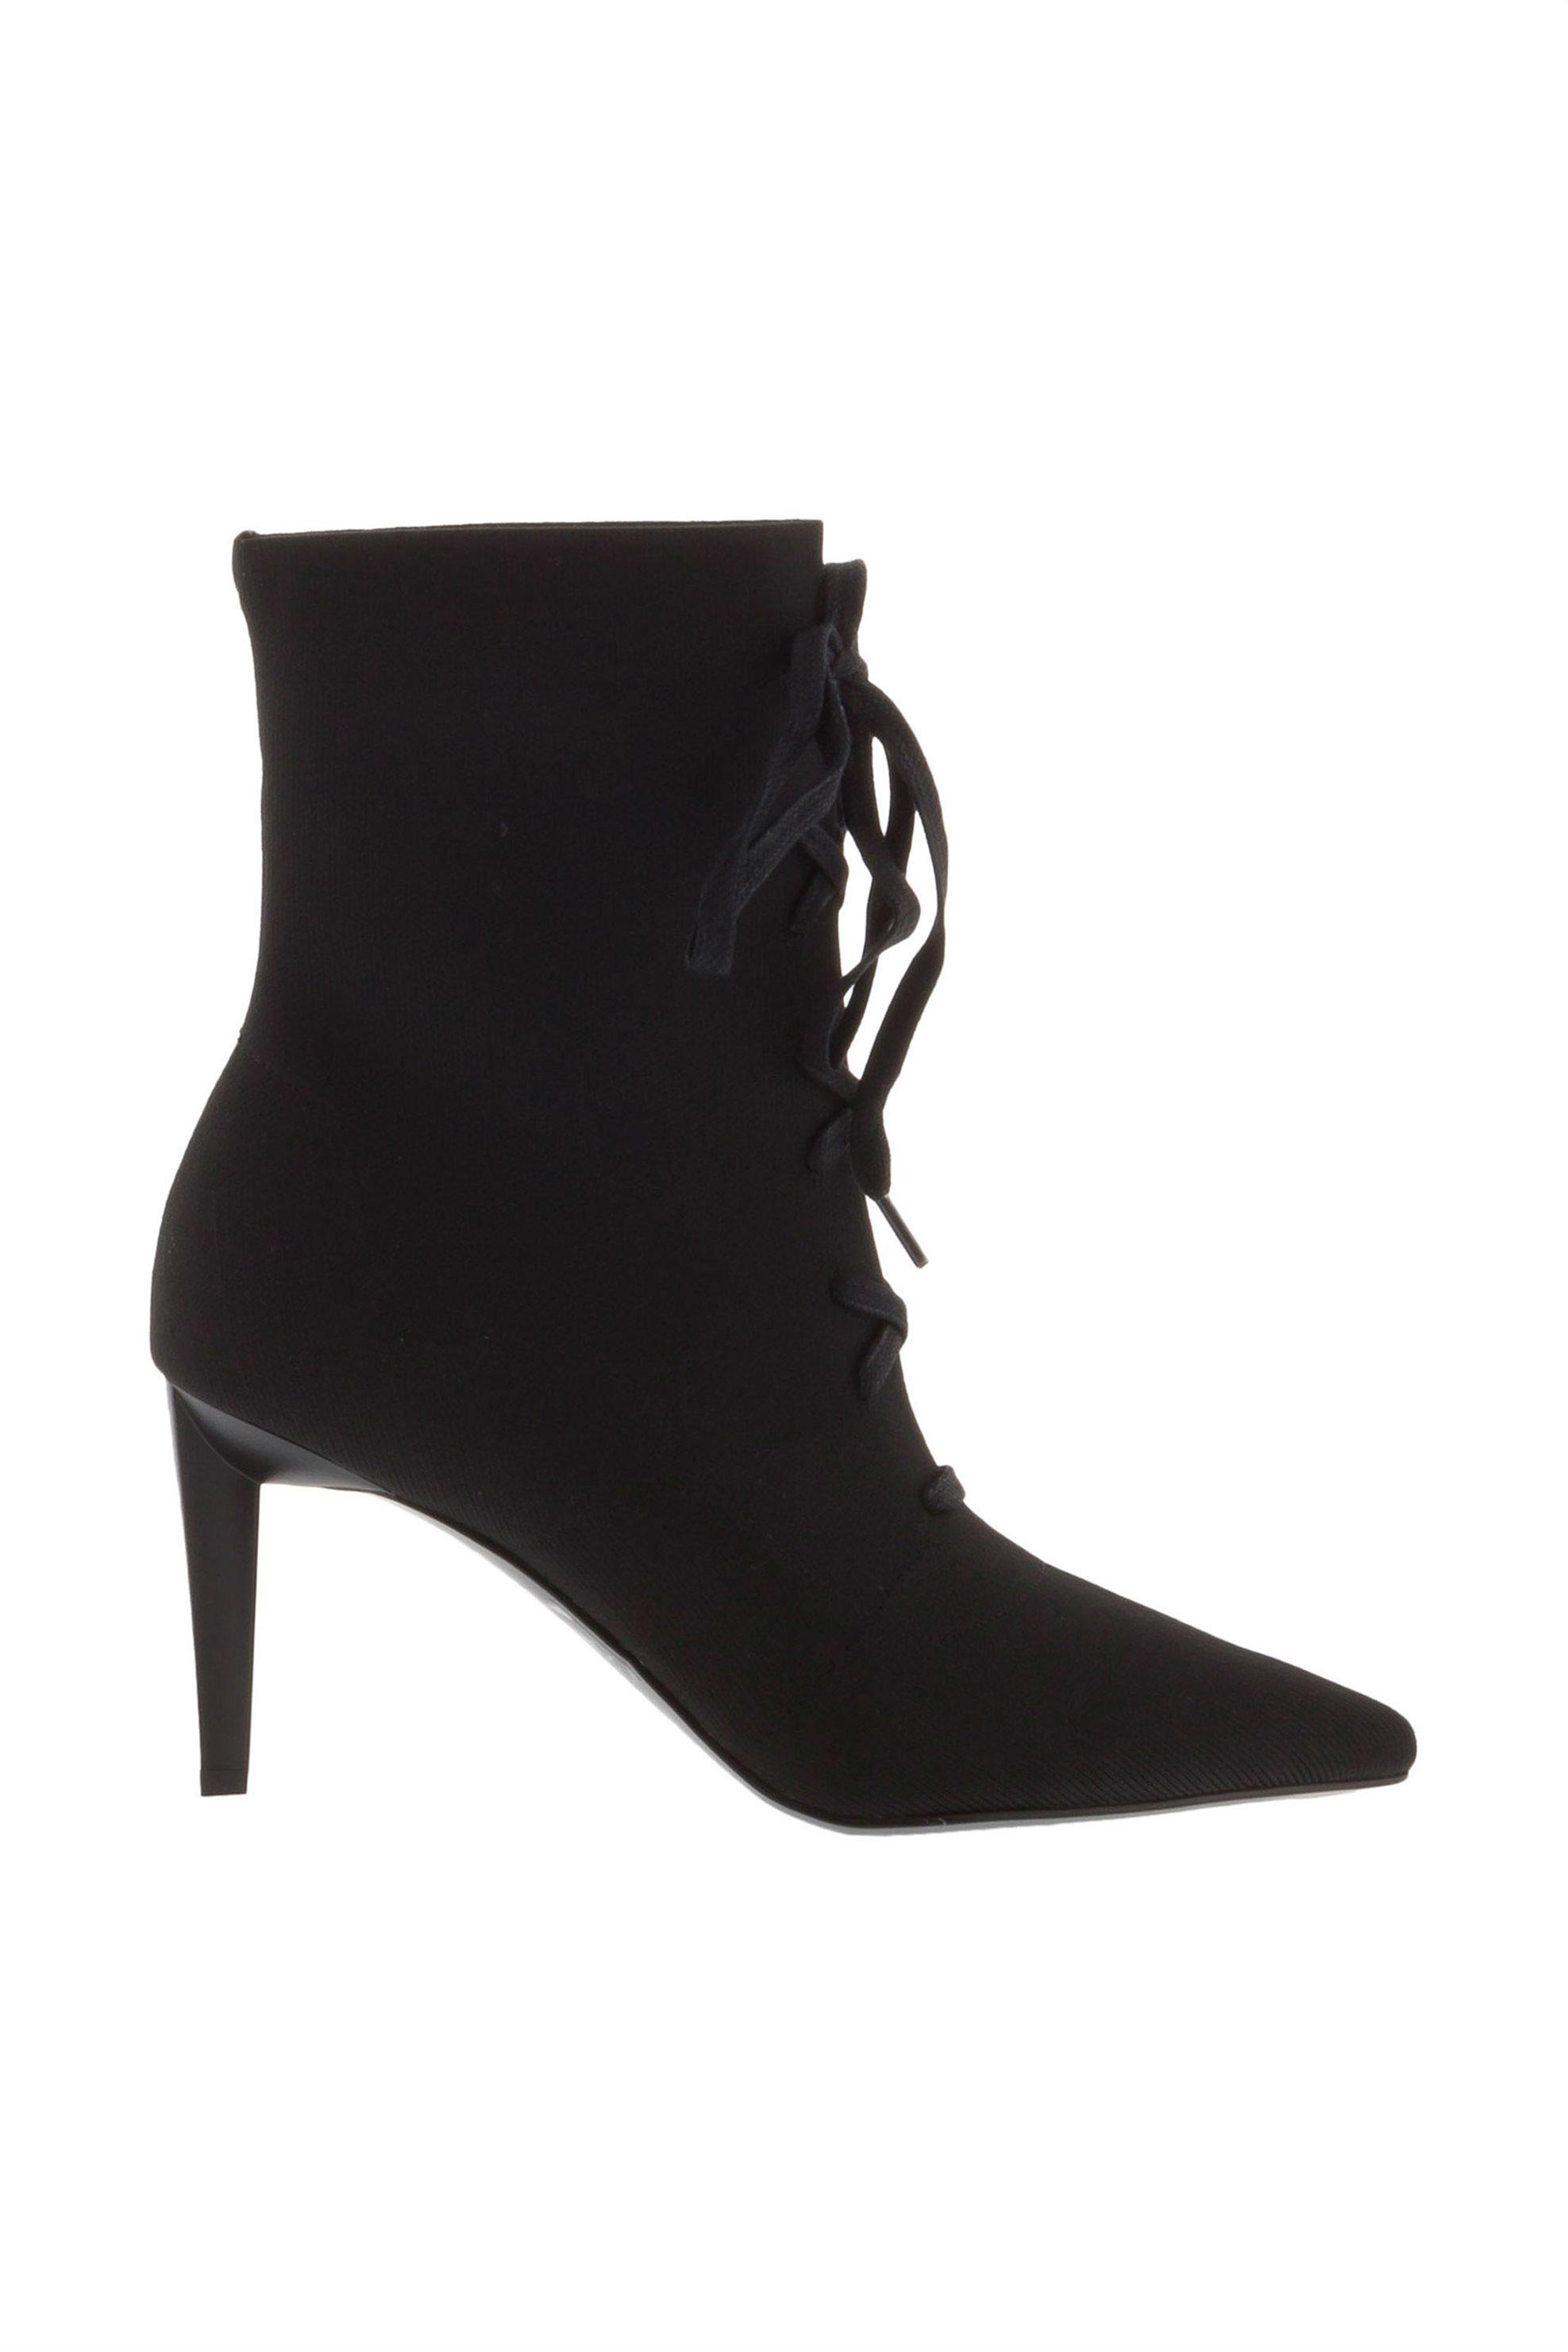 Kendall + Kylie γυναικείo μποτάκι με κορδόνια Vice - kkVICE/01 - Μαύρο γυναικα   παπουτσια   μποτάκια